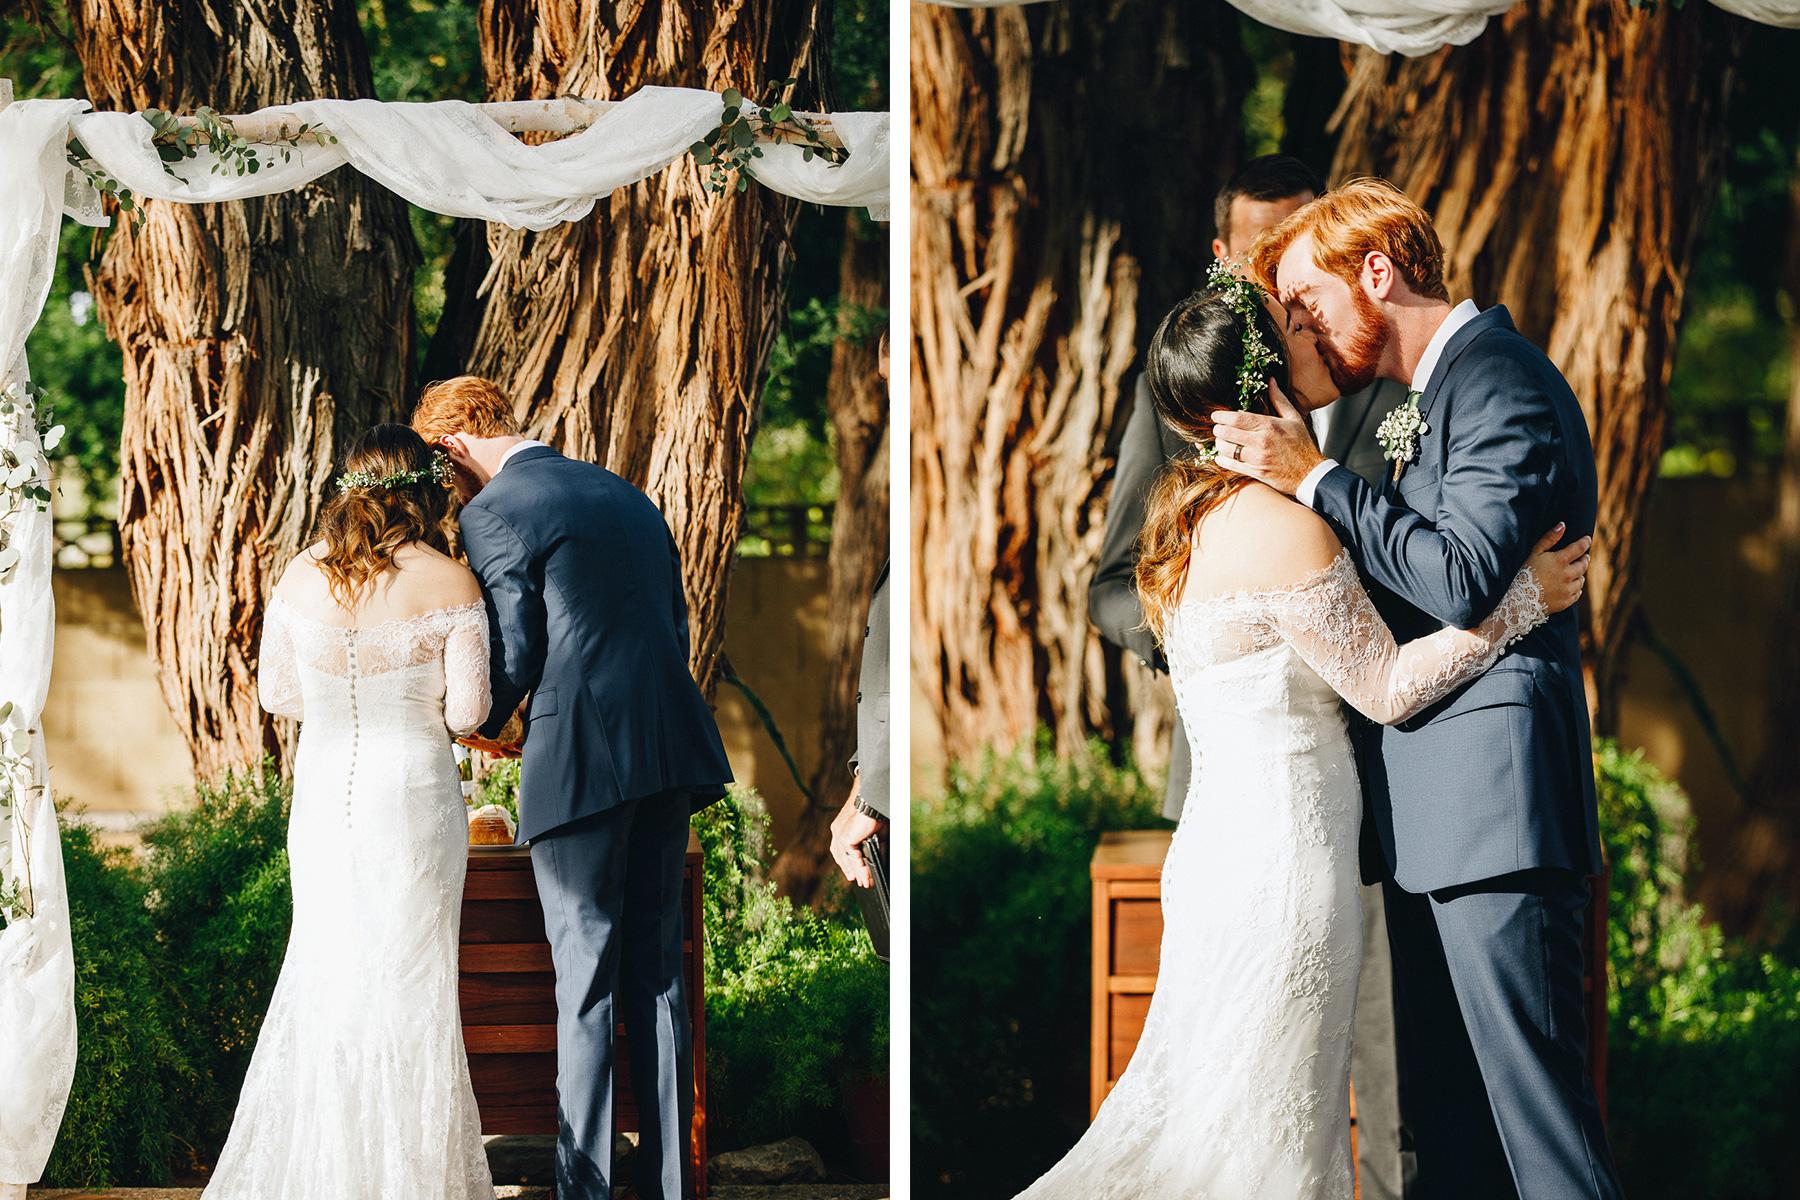 181104-Luxium-Weddings-Arizona-@matt__Le-Brandon-Kariana-Phoenix-Valley-Garden-Center-1073.jpg